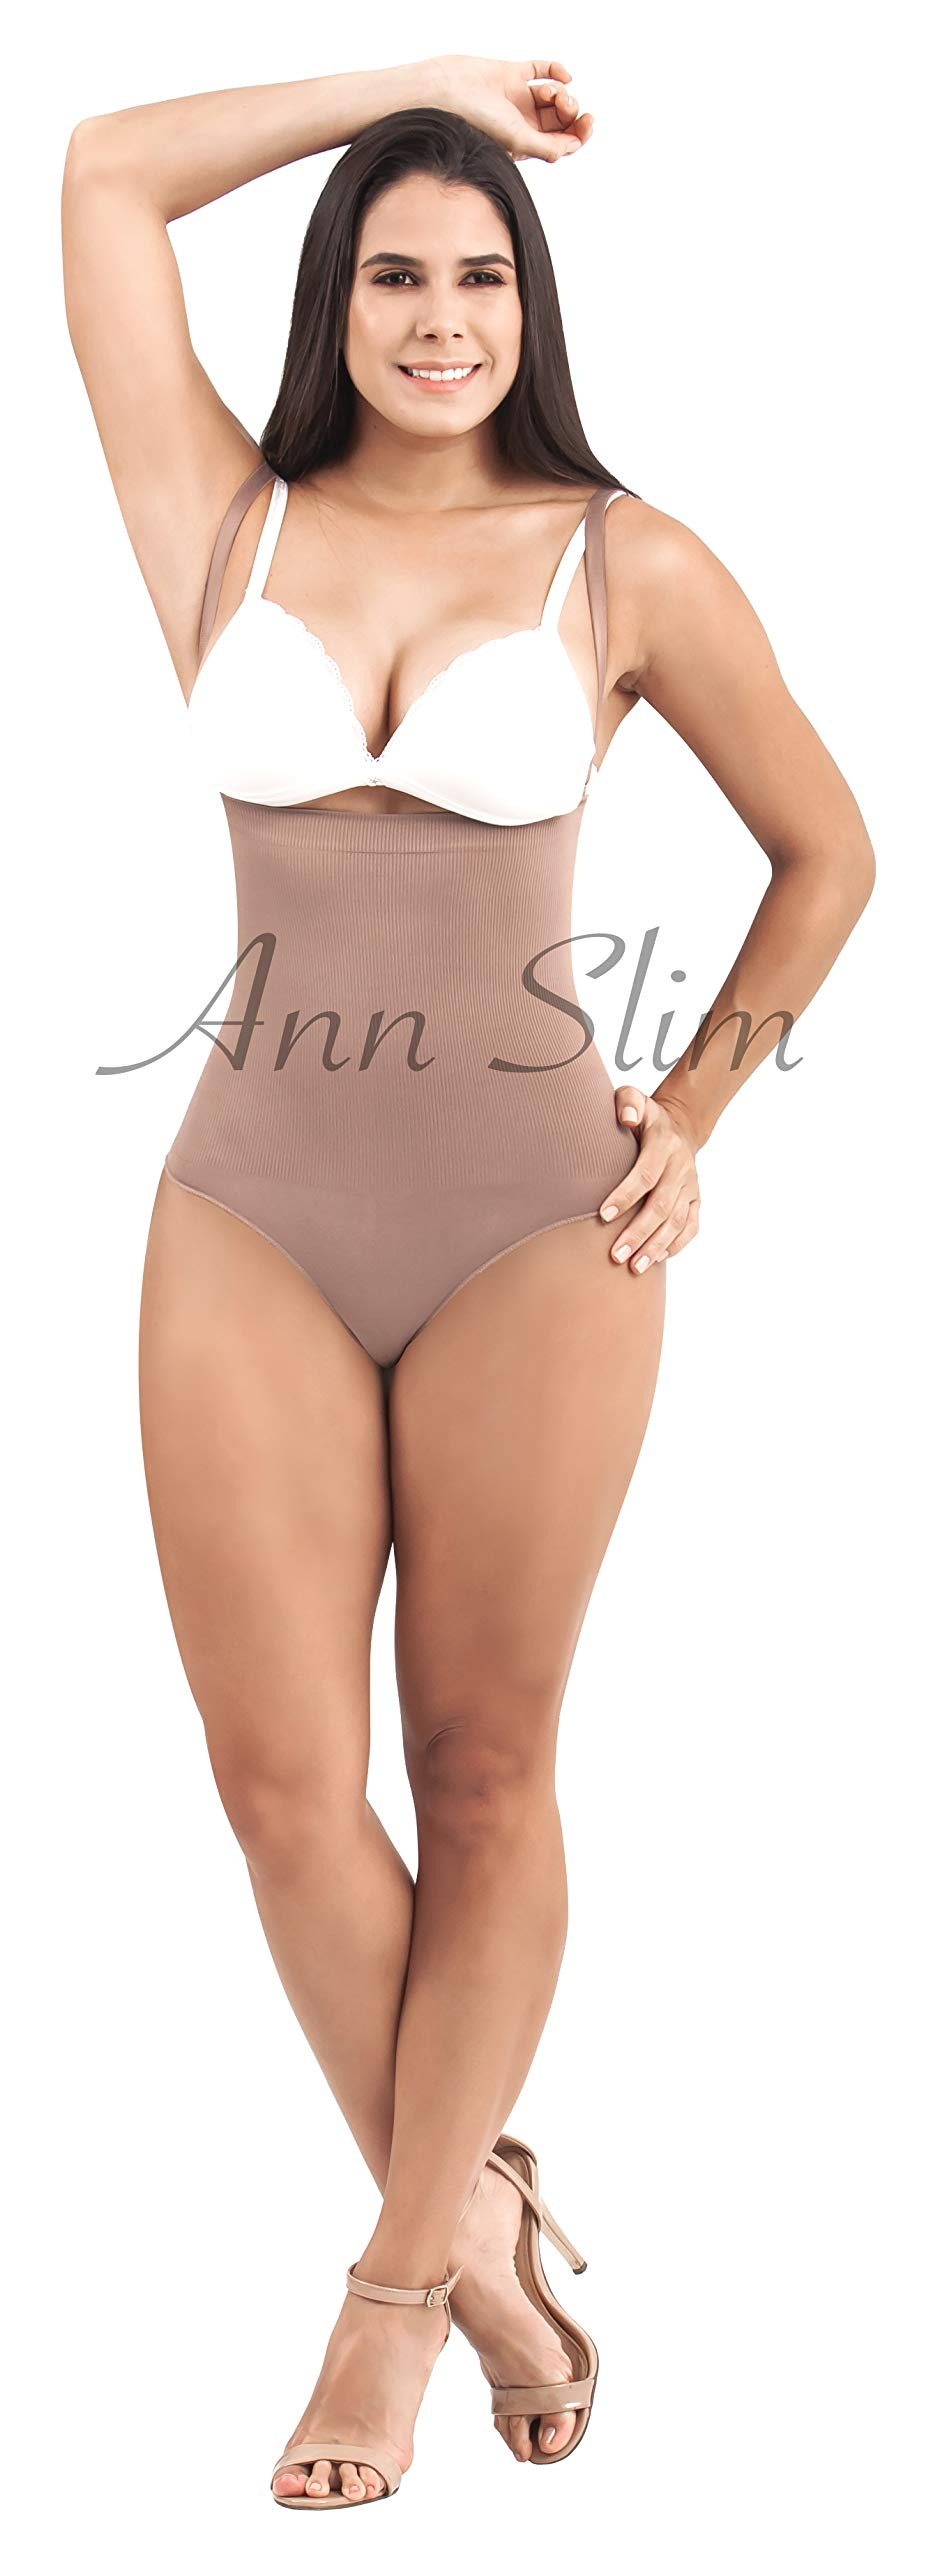 ANN SLIM Women Bodysuit Strapless Thong Body Shaper Fajas Colombianas Moldeadoras TJ02L8 (Cocoa, Large)